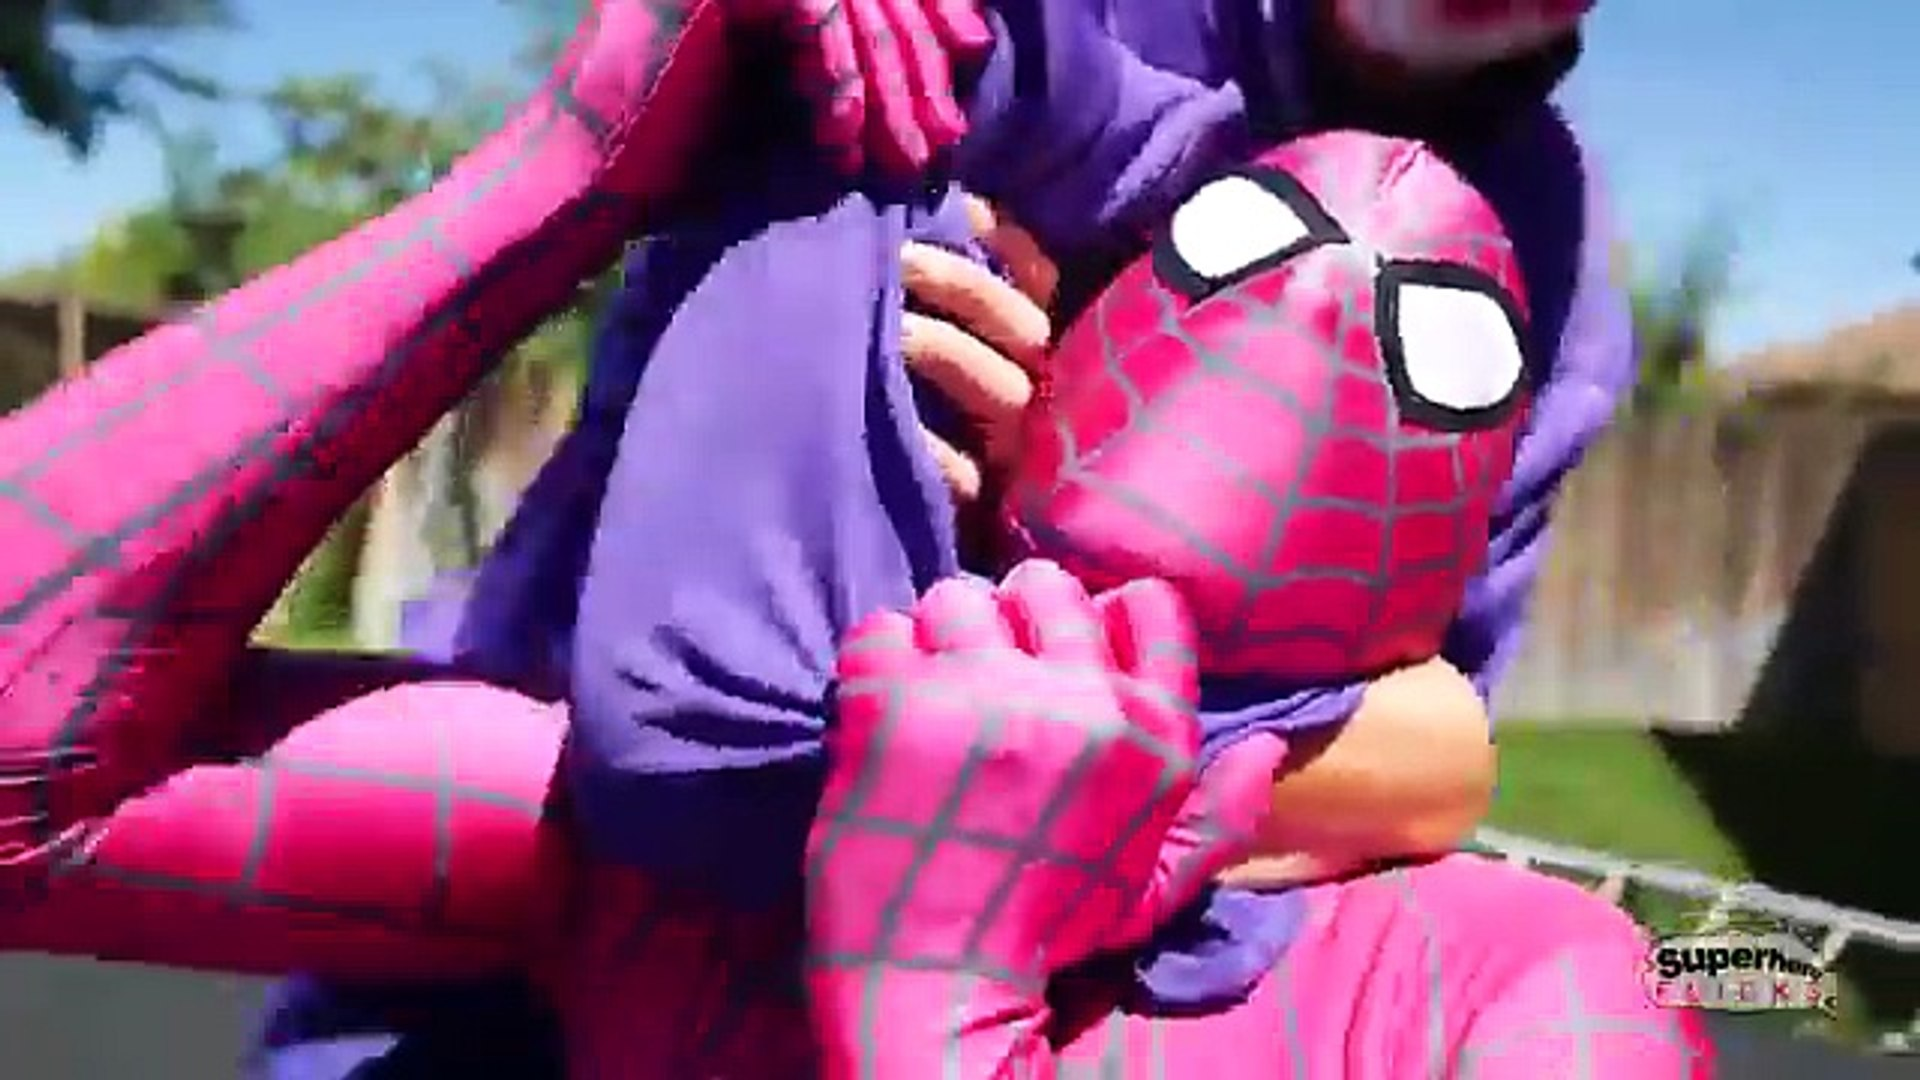 The Amazing Pink Spiderman Vs Crazy Joker Vs Bearded Joker Real Life Superhero Movie Vidéo Dailymotion